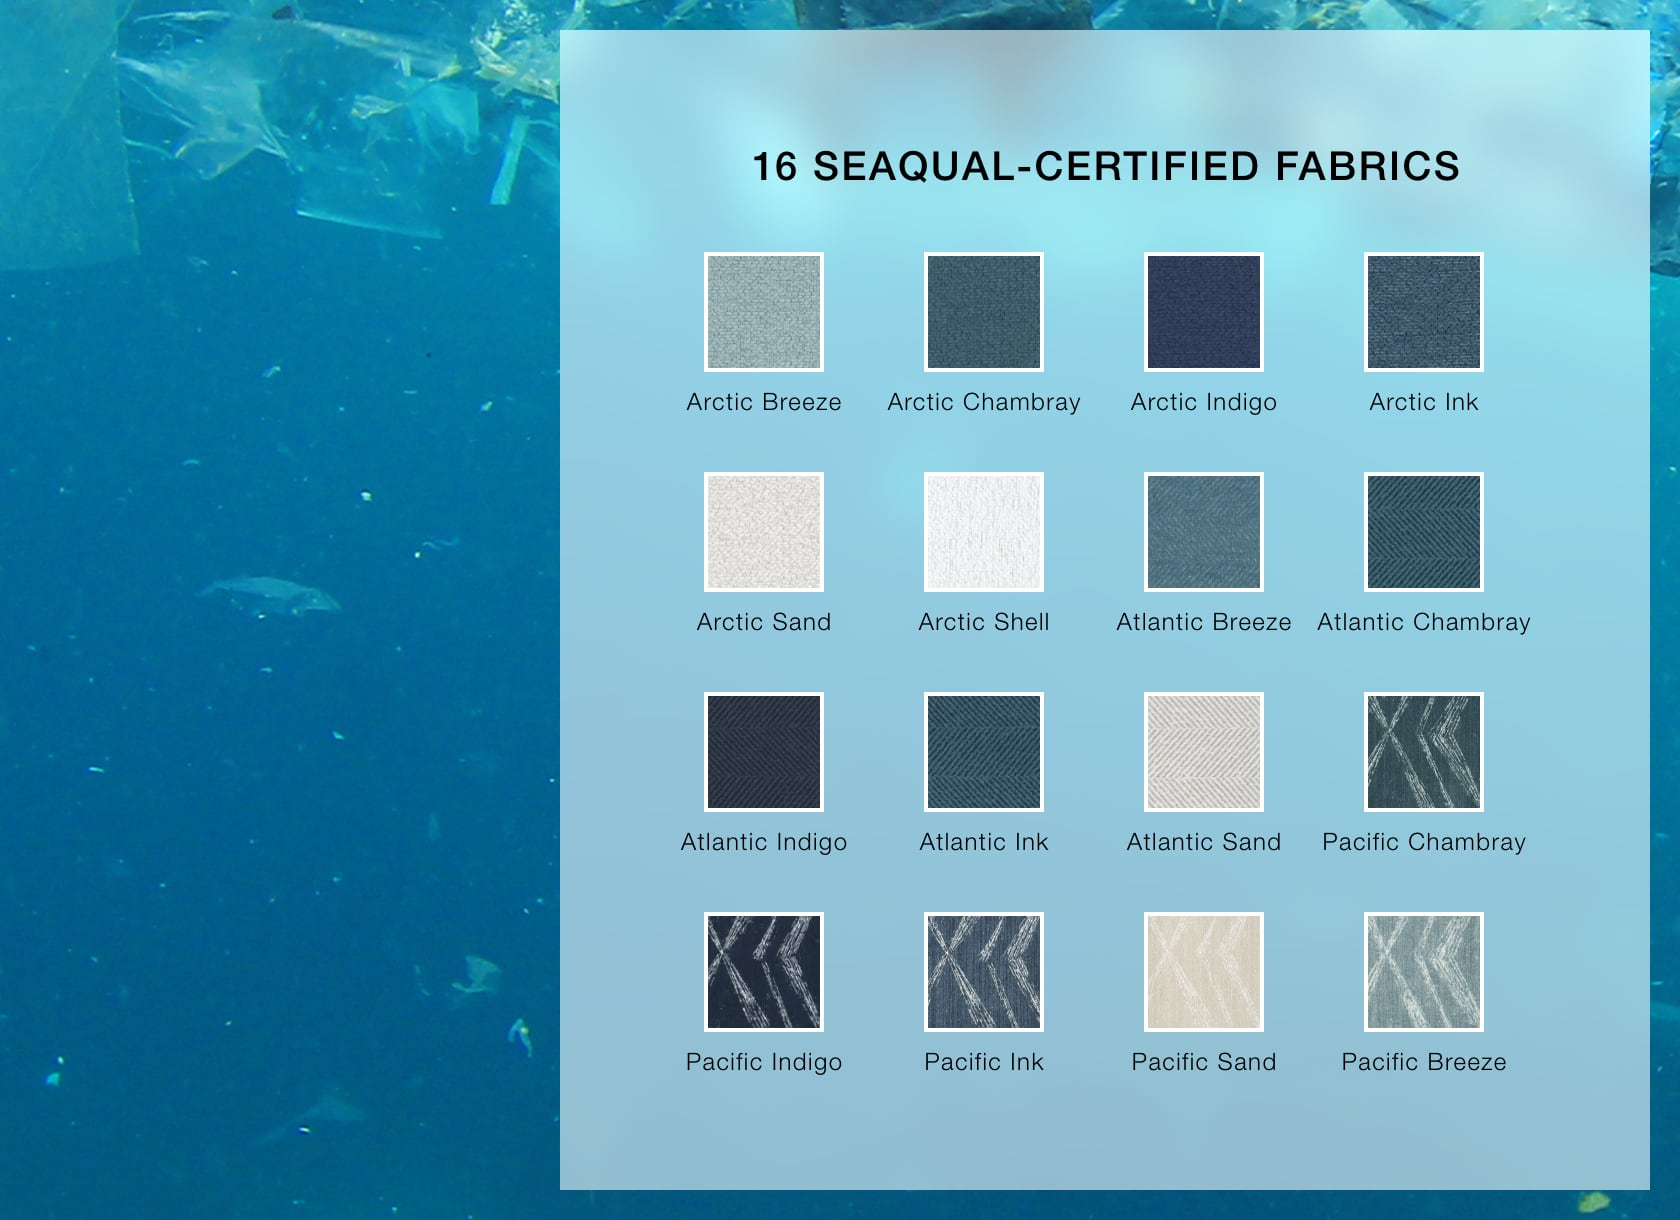 Arhaus offers 16 SEAQUAL-certified fabrics